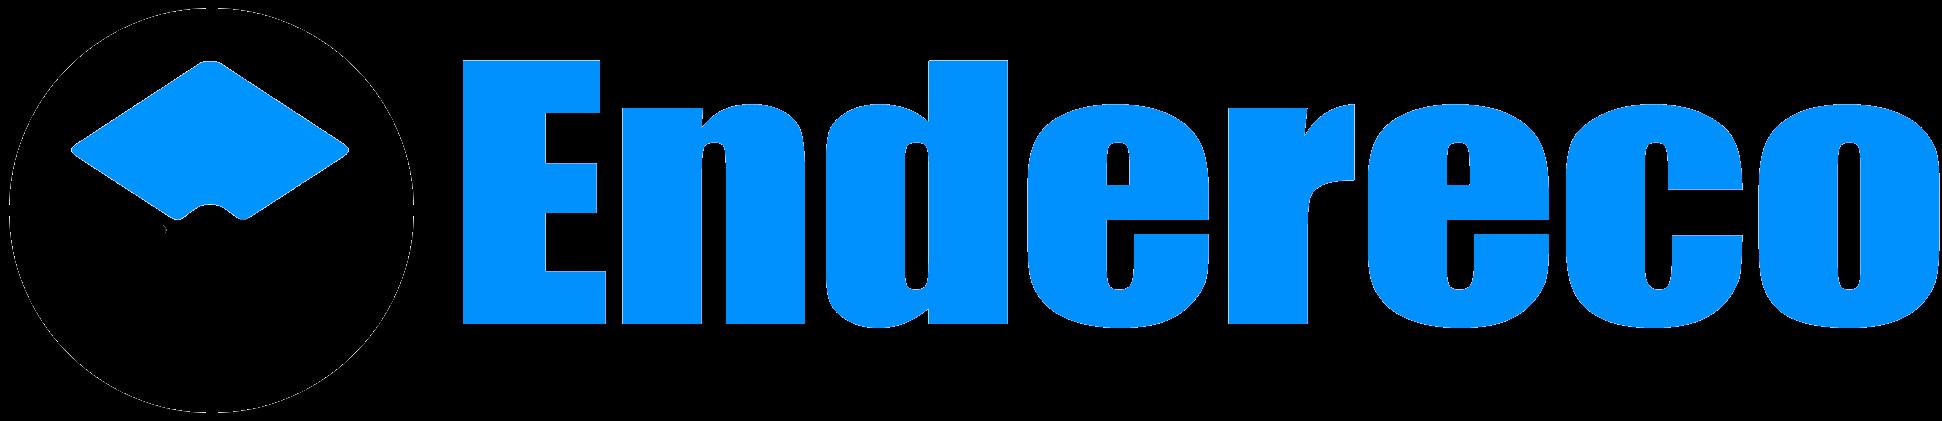 Endereco - Master Data Quality Magement